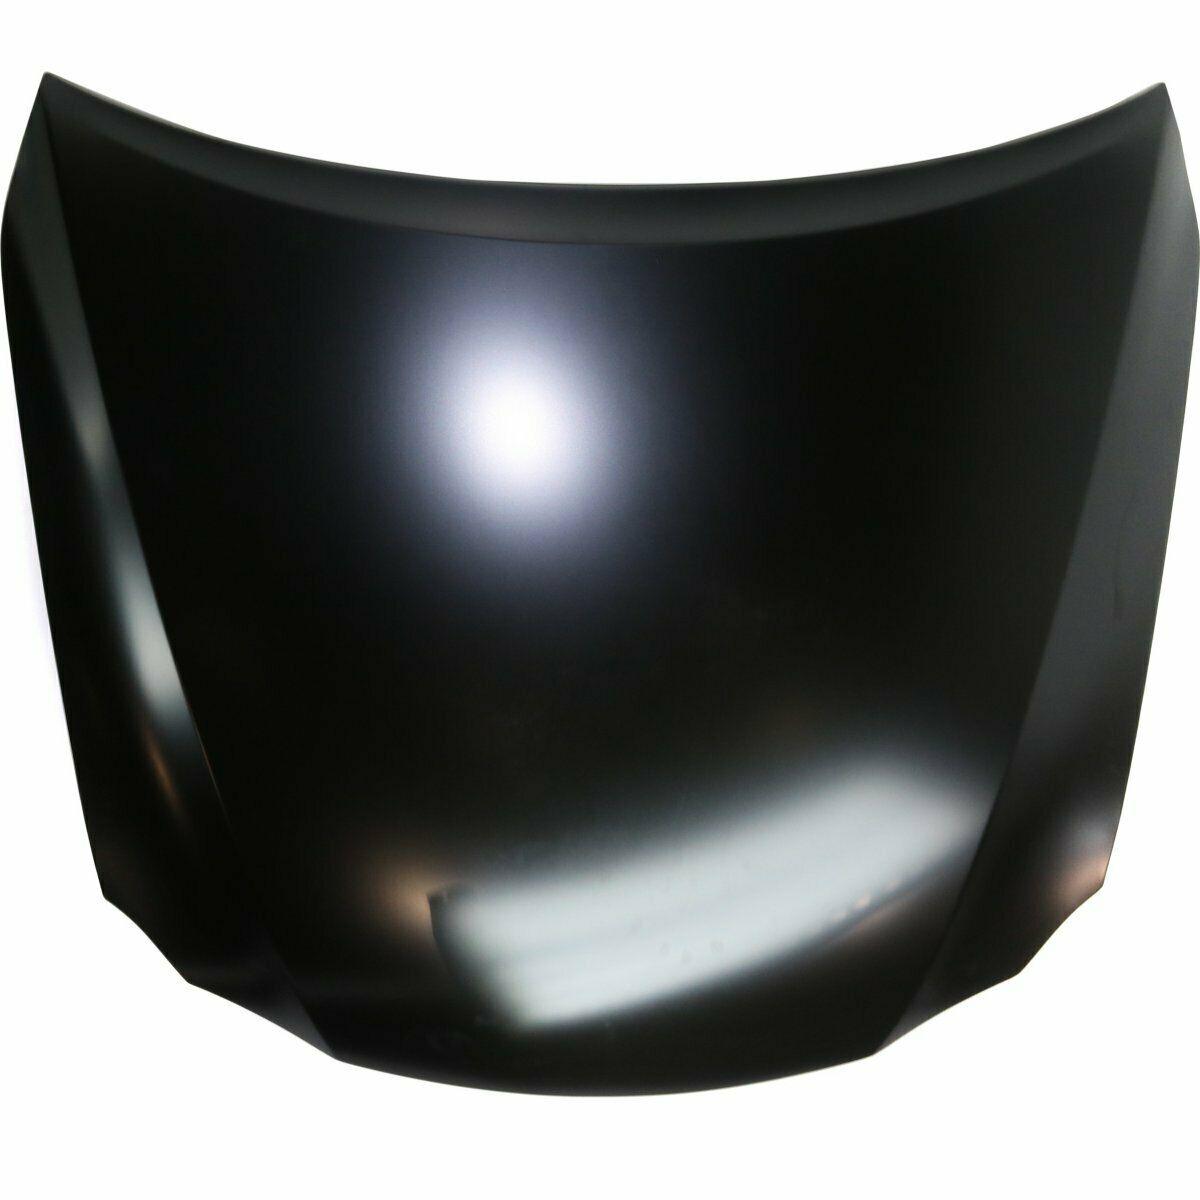 lx1230110.jpg